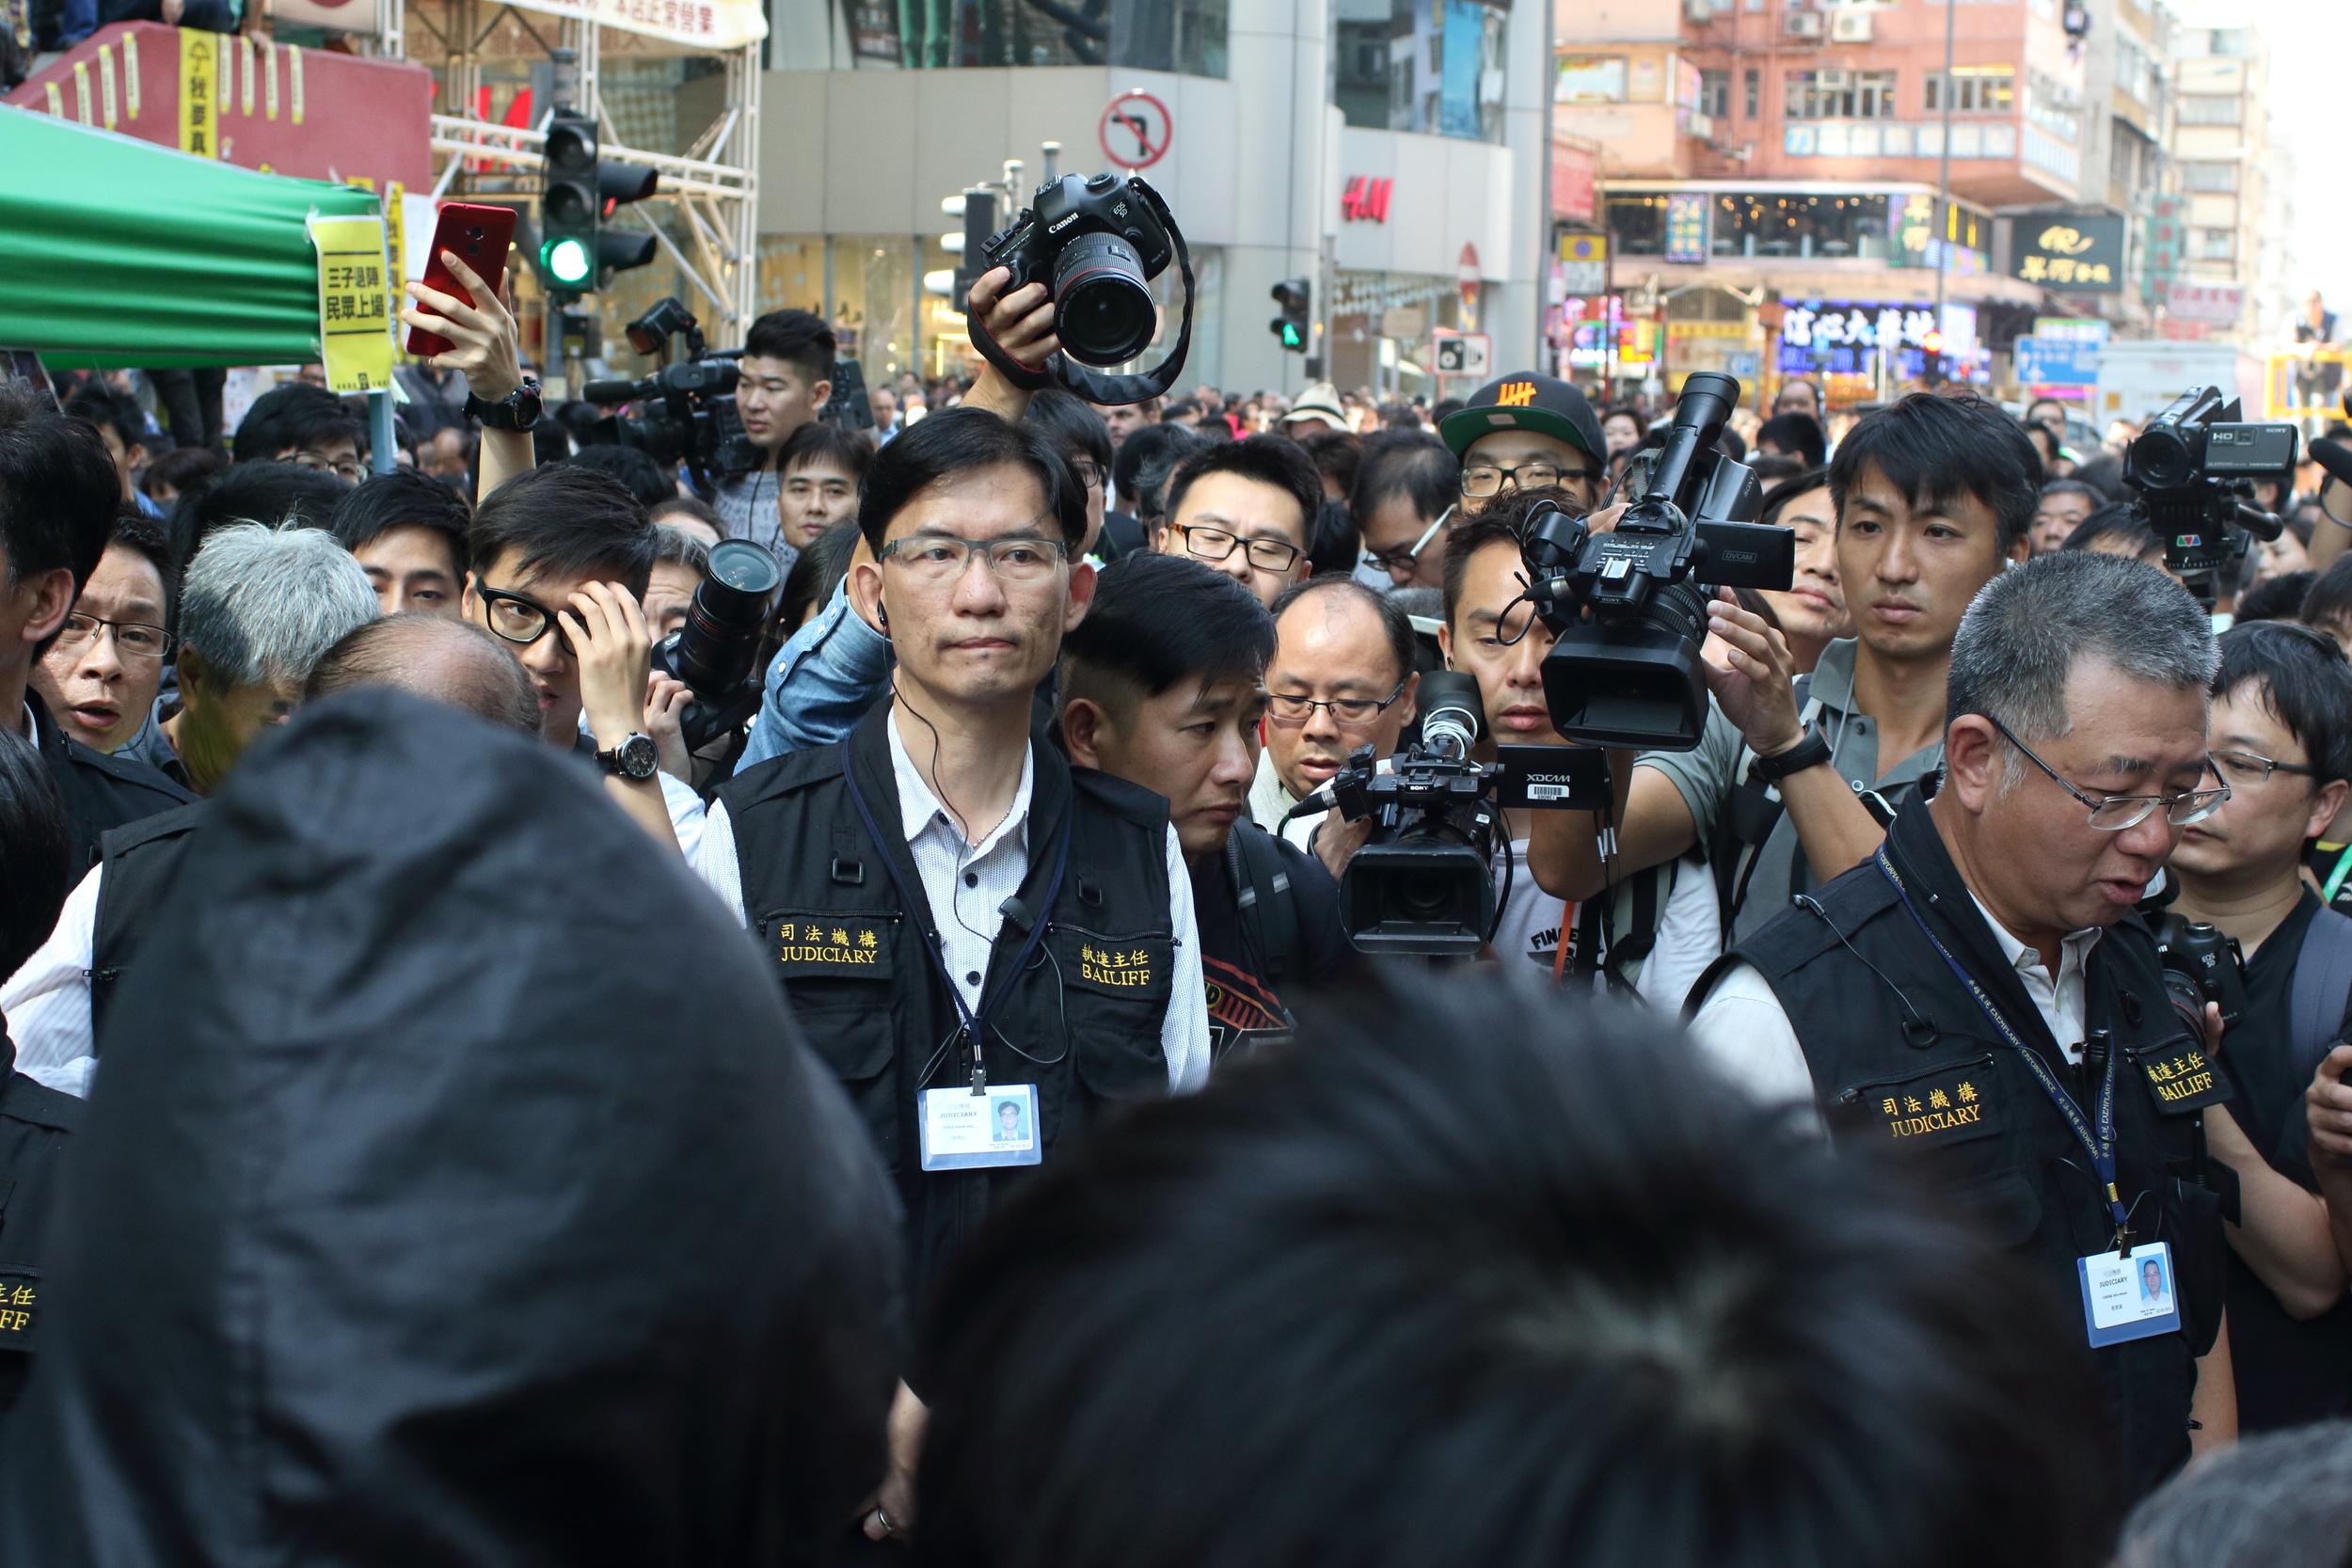 jfung1 Mongkok Argyle Clearance20.JPG